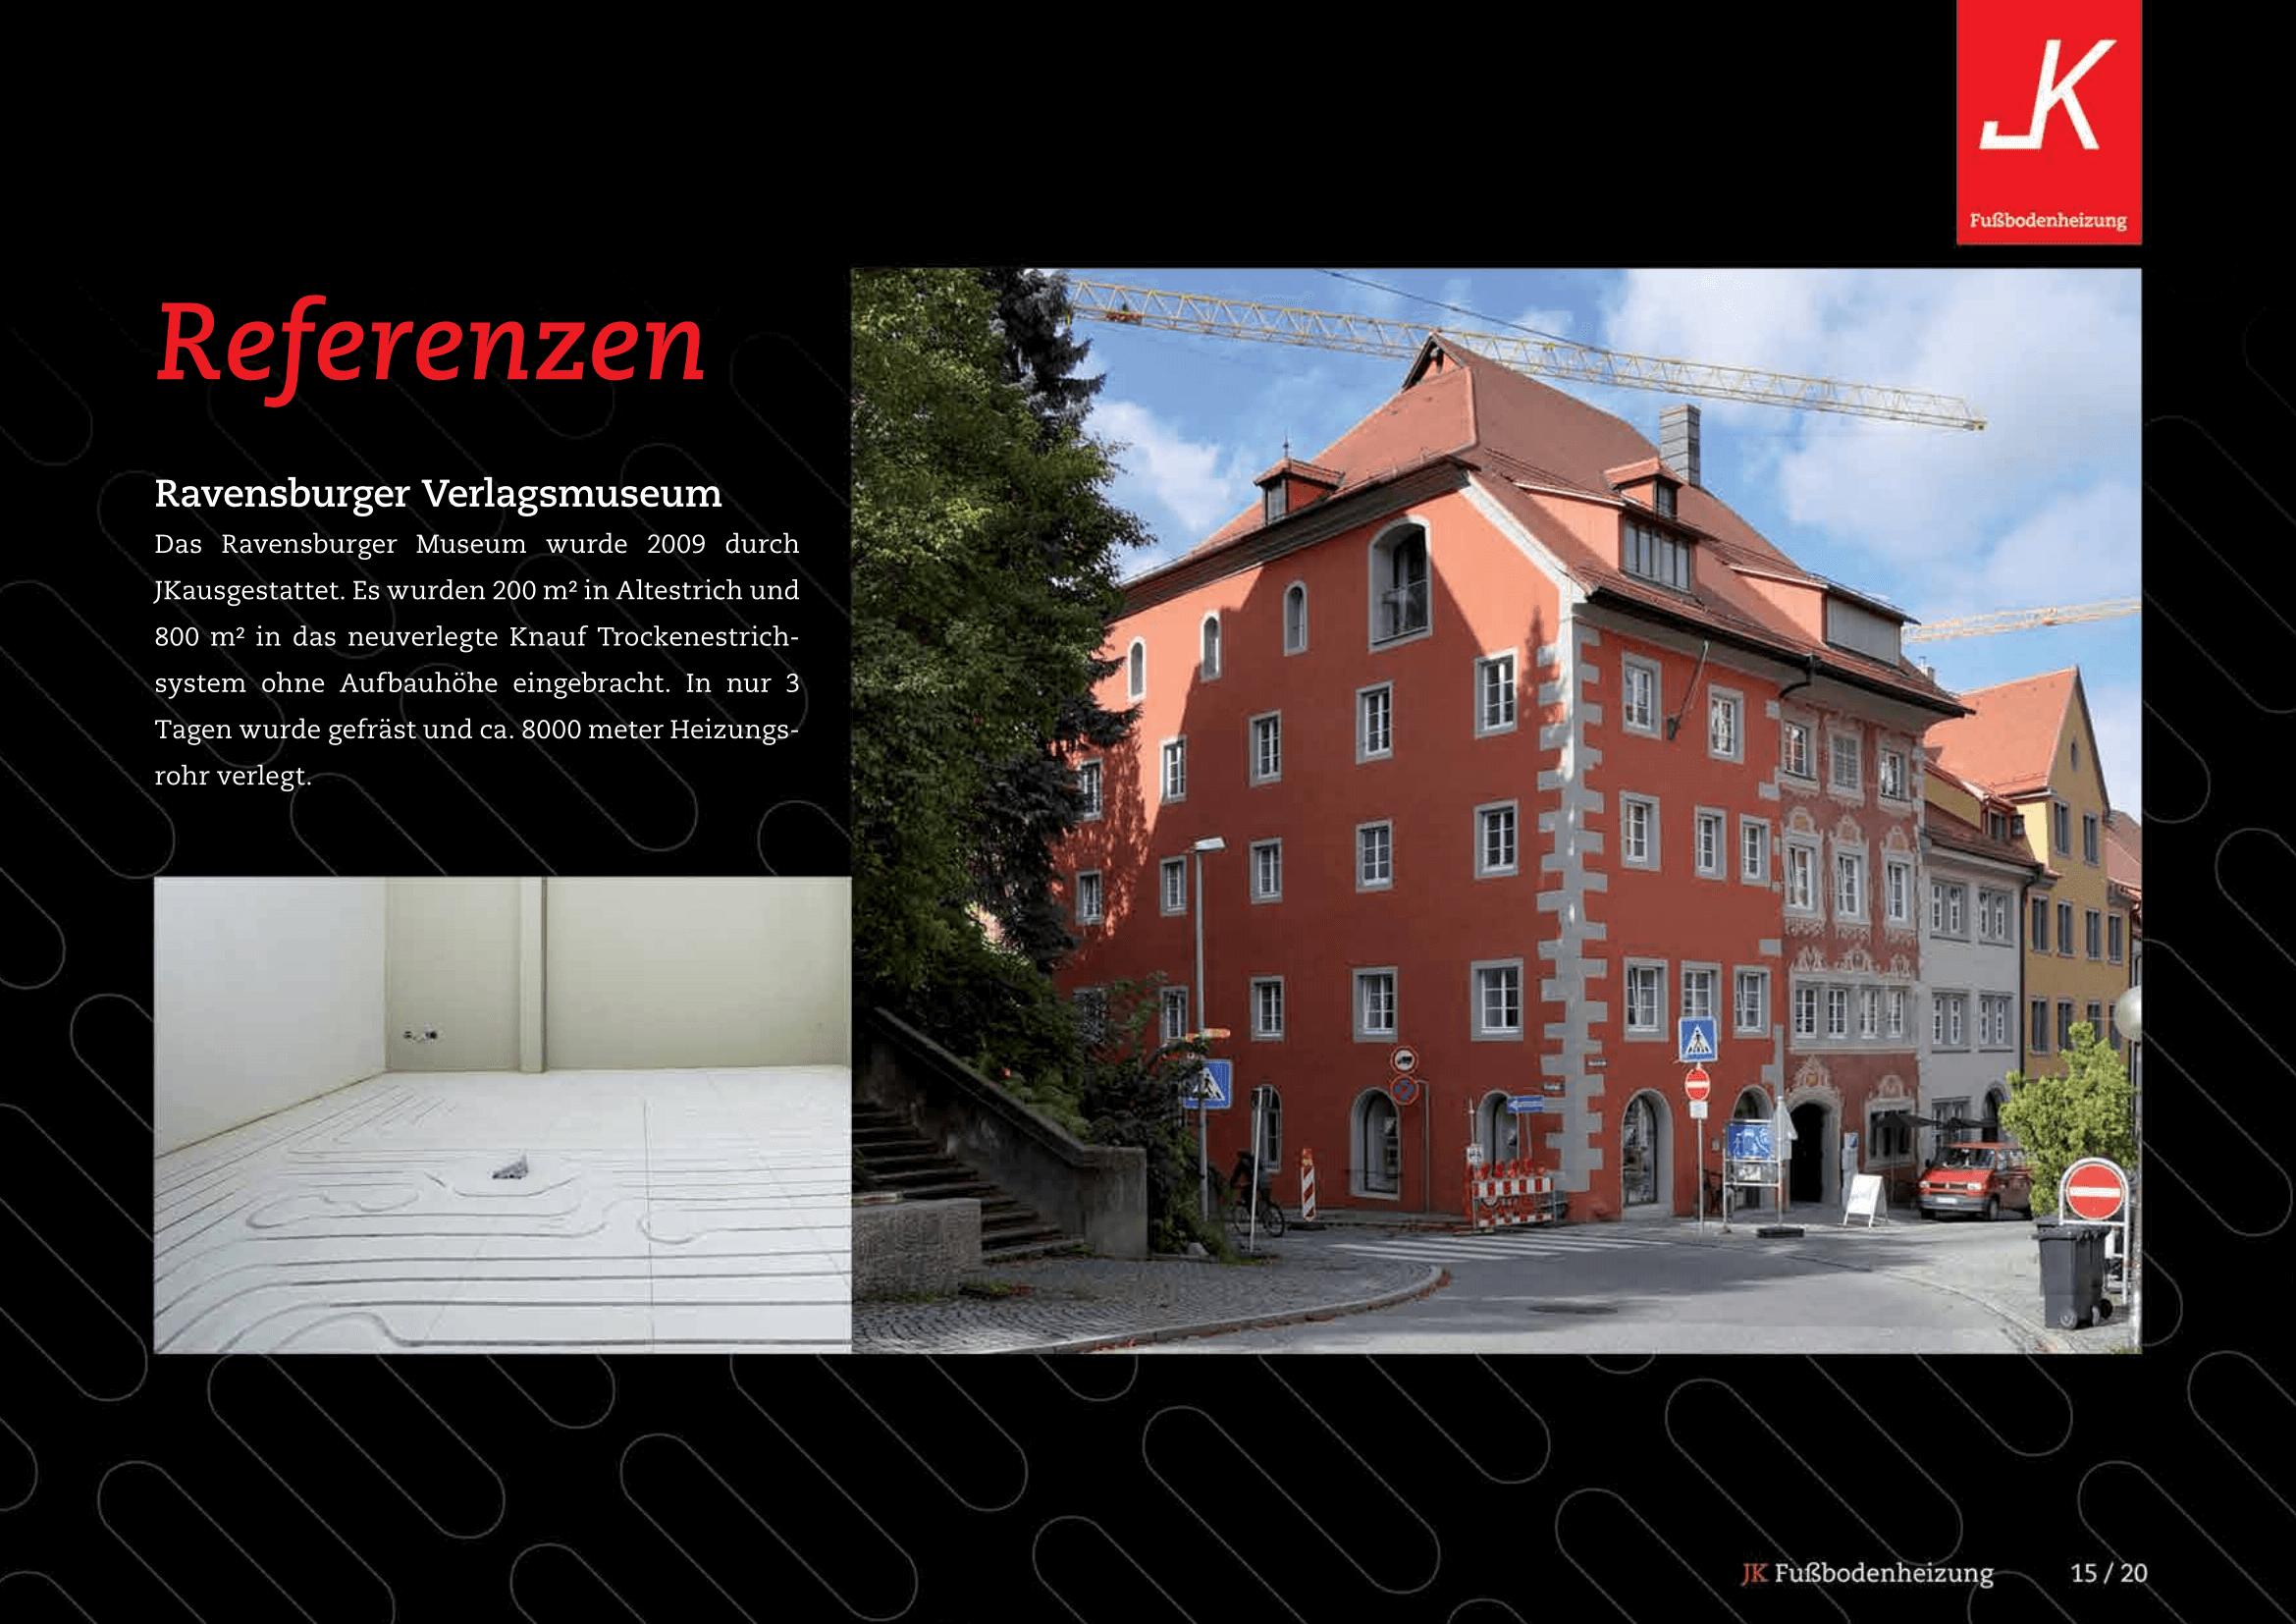 https://www.bonntech.de/wp-content/uploads/2018/02/JK-Beursbrochure-2016-Web_Page_15.png